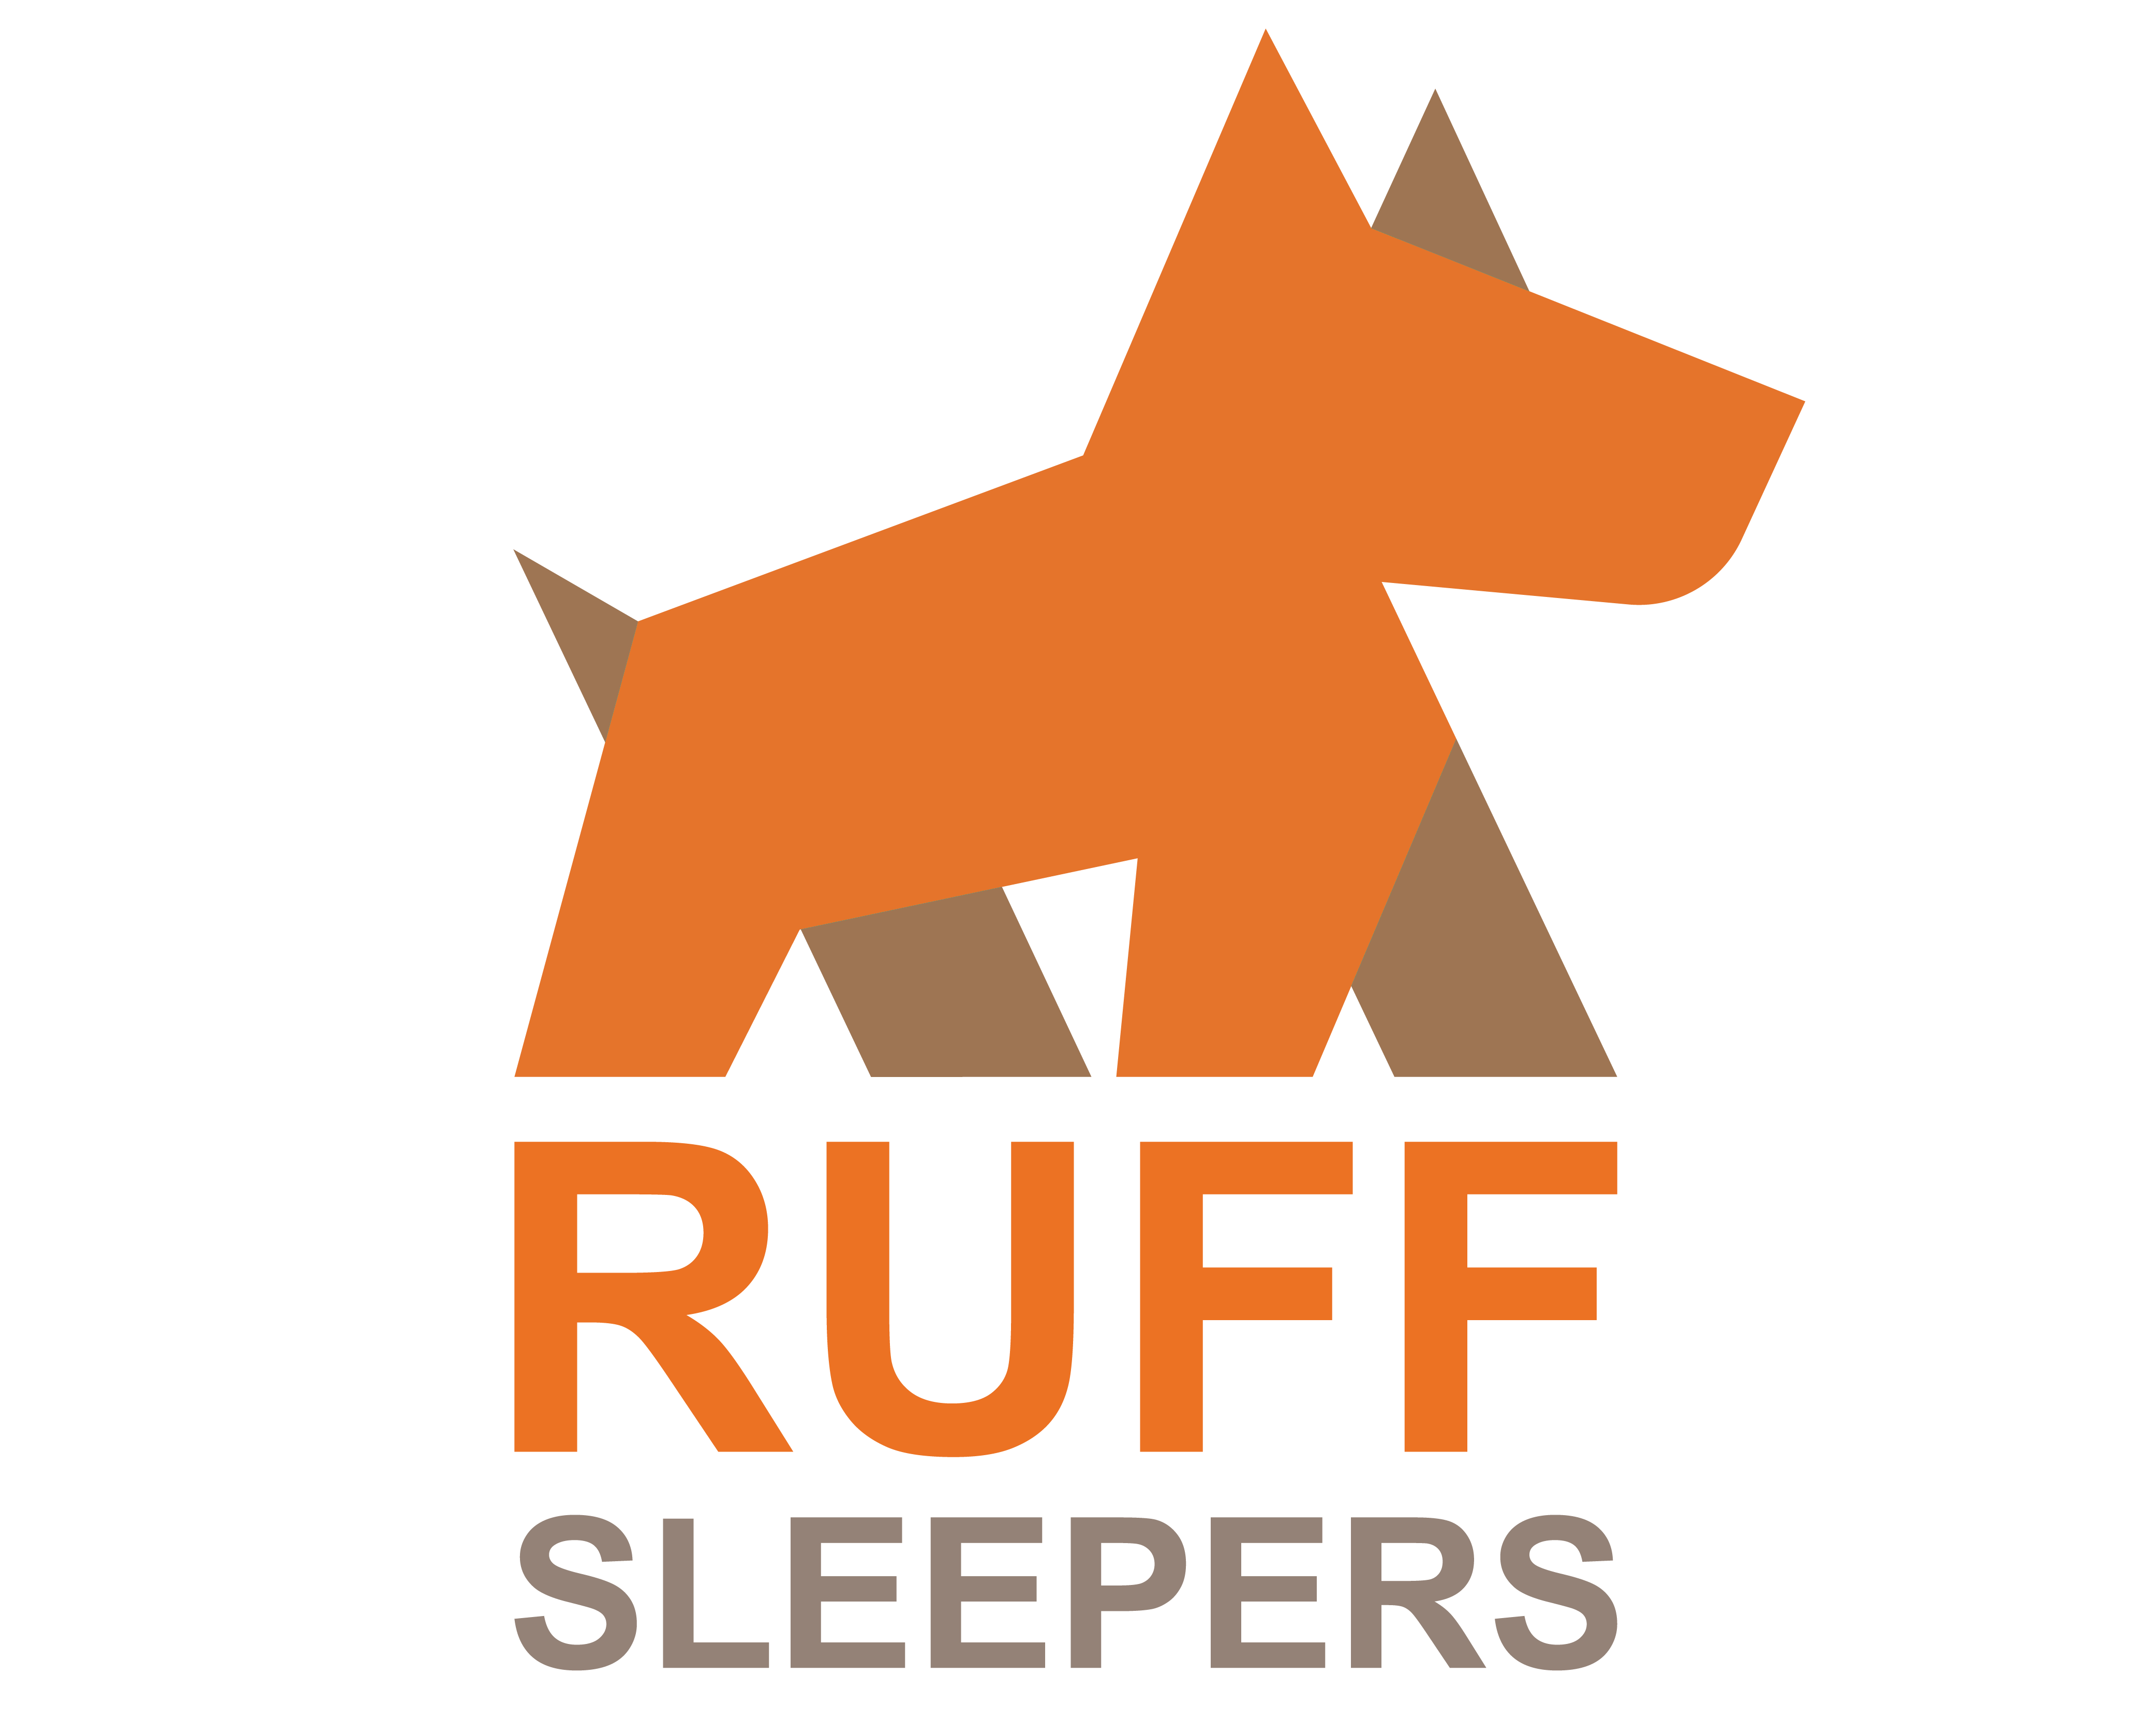 RuffSleepers